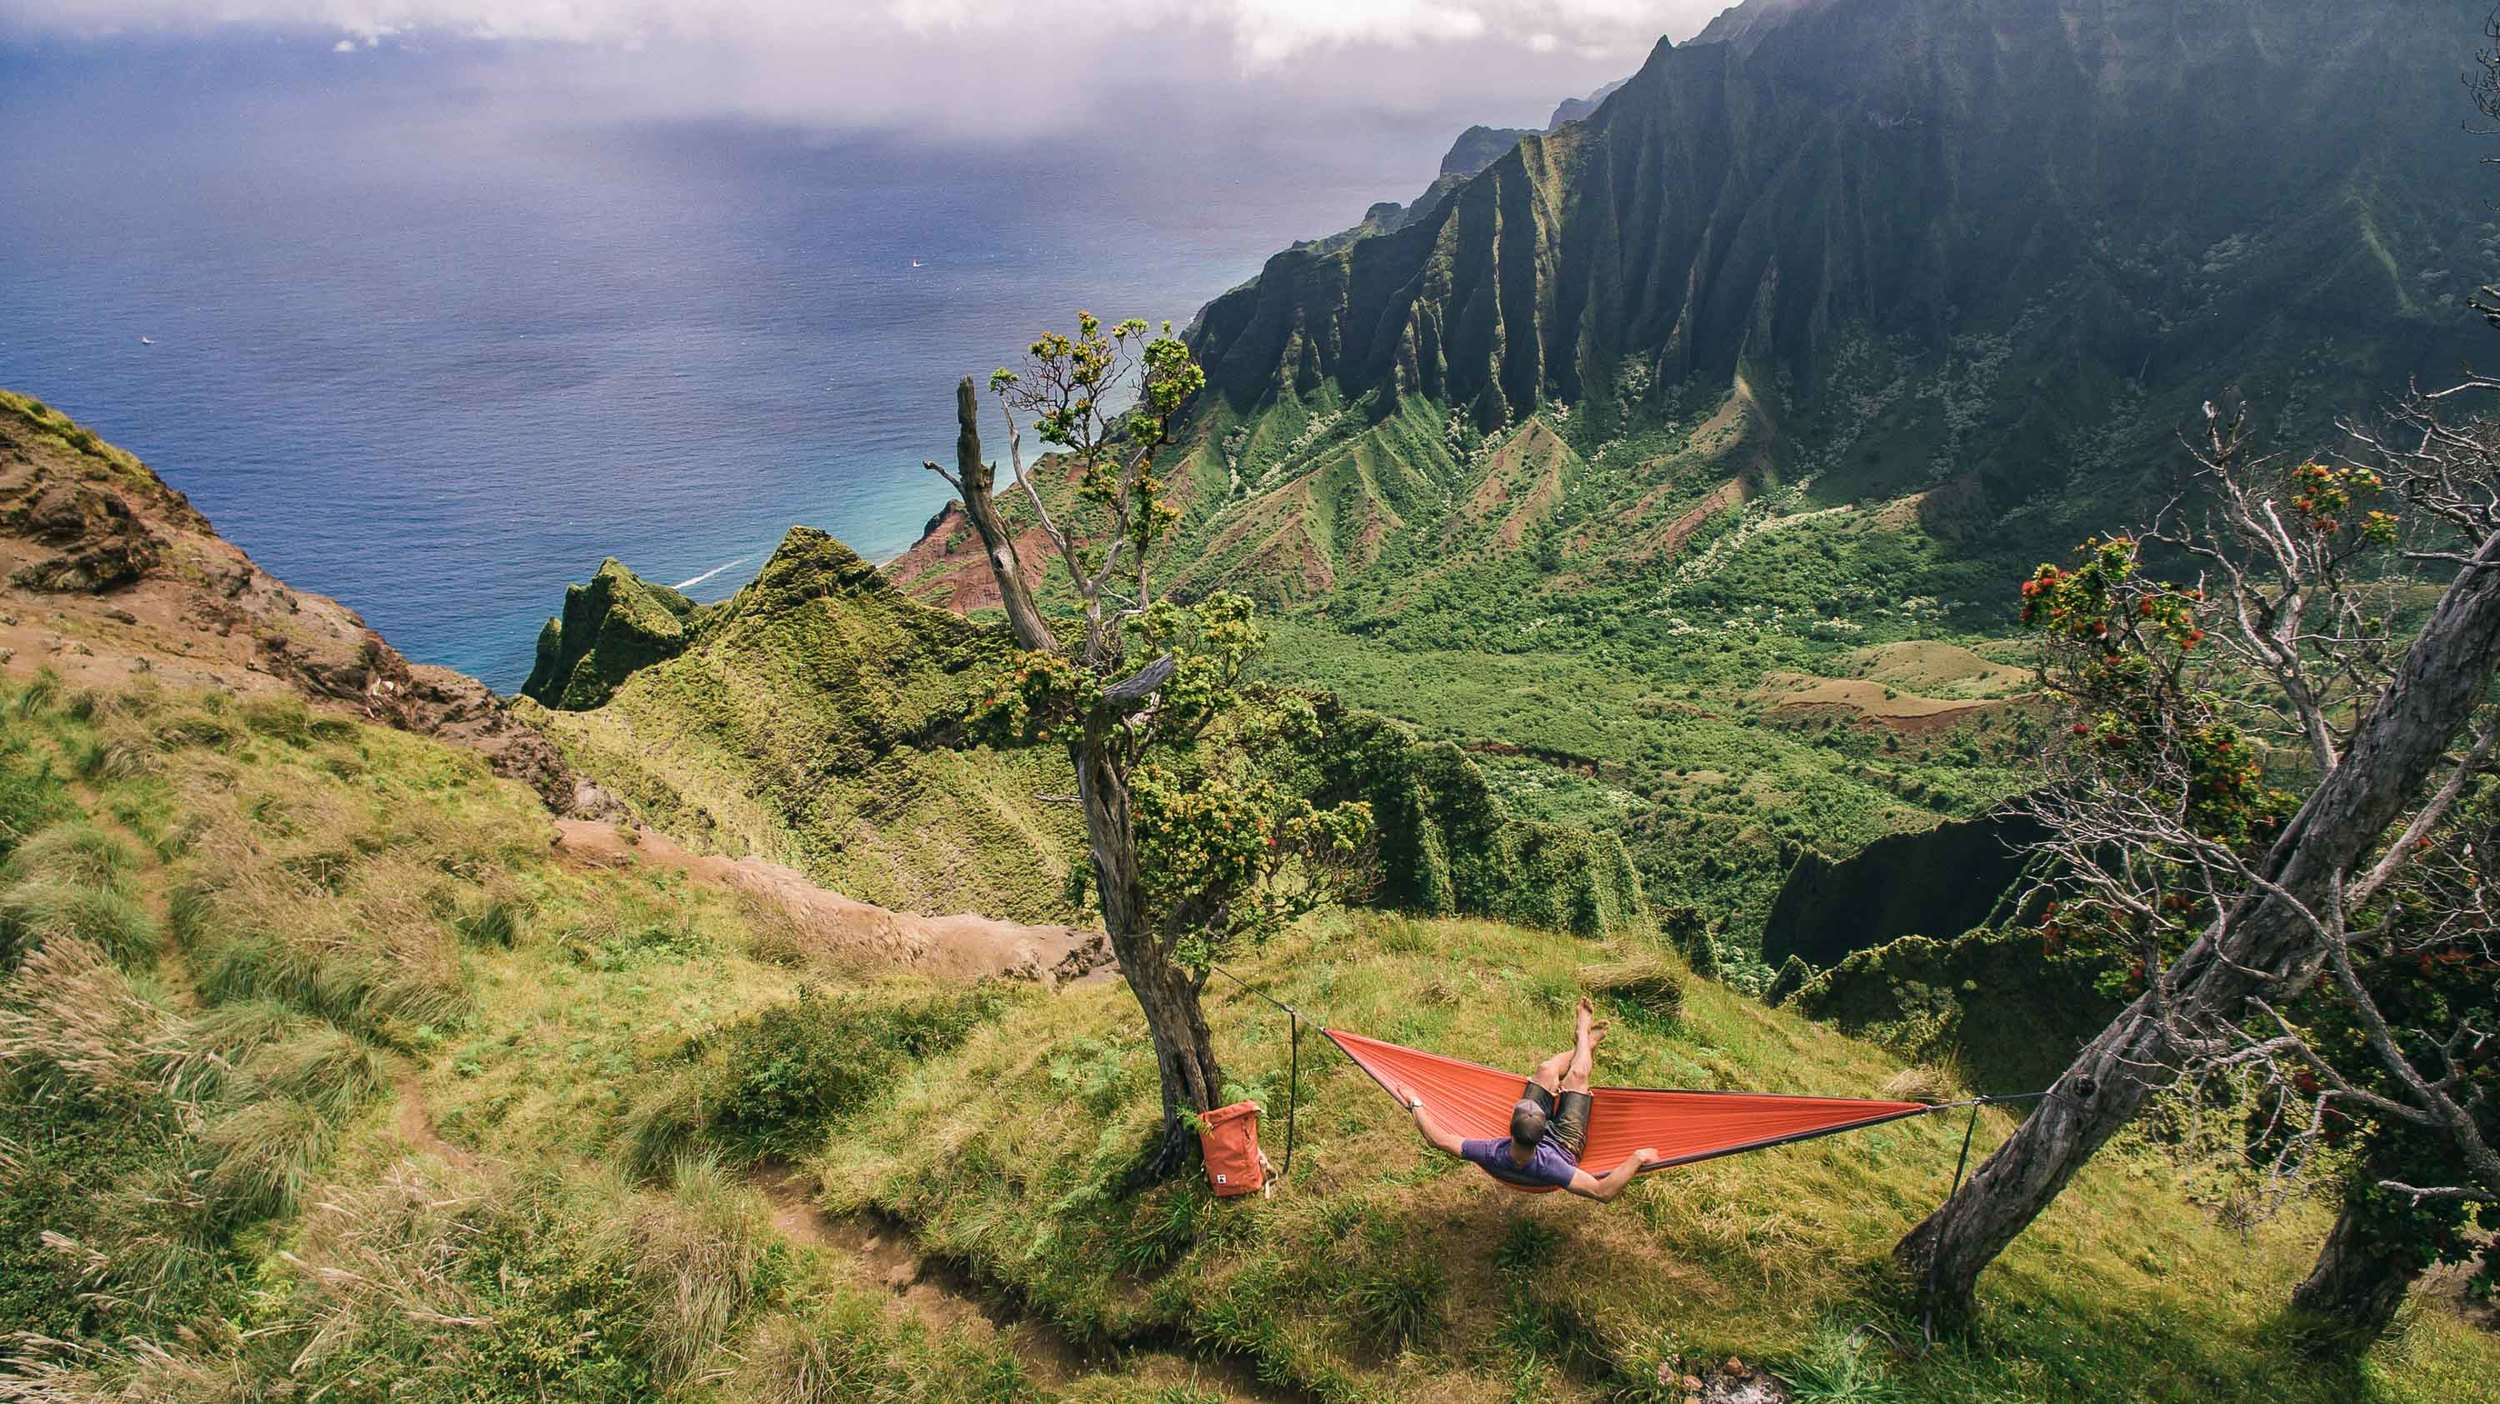 bryce-johnson-kalalau-ridge-kauai-hiking-hammock-palmwood-aloha-exchange-21.jpg